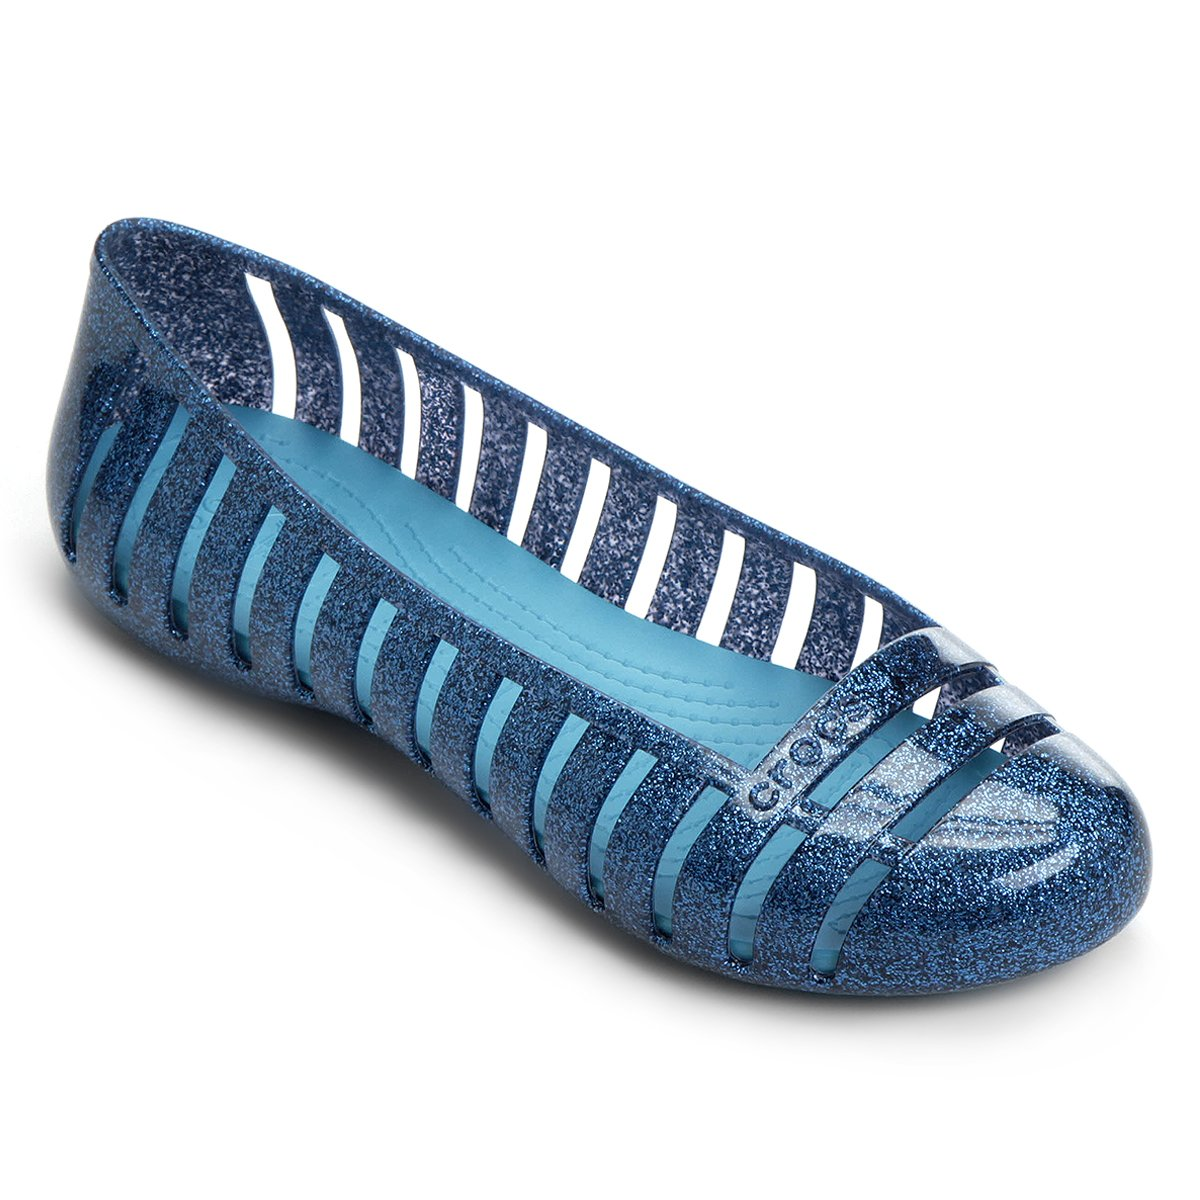 58aa27d1a Sapatilha Crocs Adrina 2 Glitter Flat GS Juvenil - Compre Agora ...